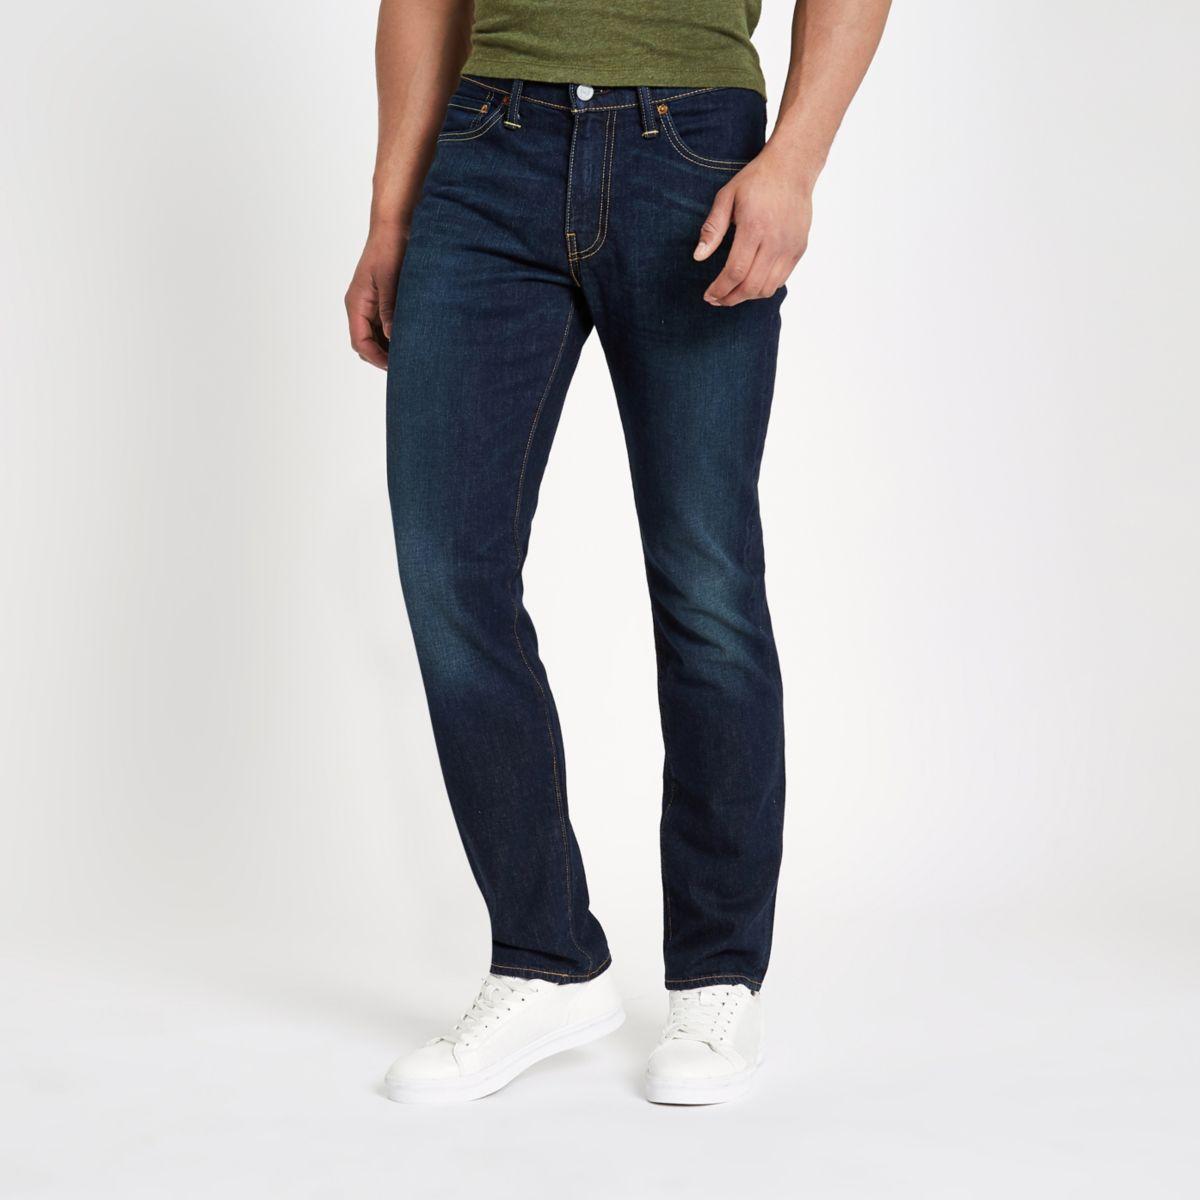 Levi's 511 - Donkerblauwe slim-fit jeans